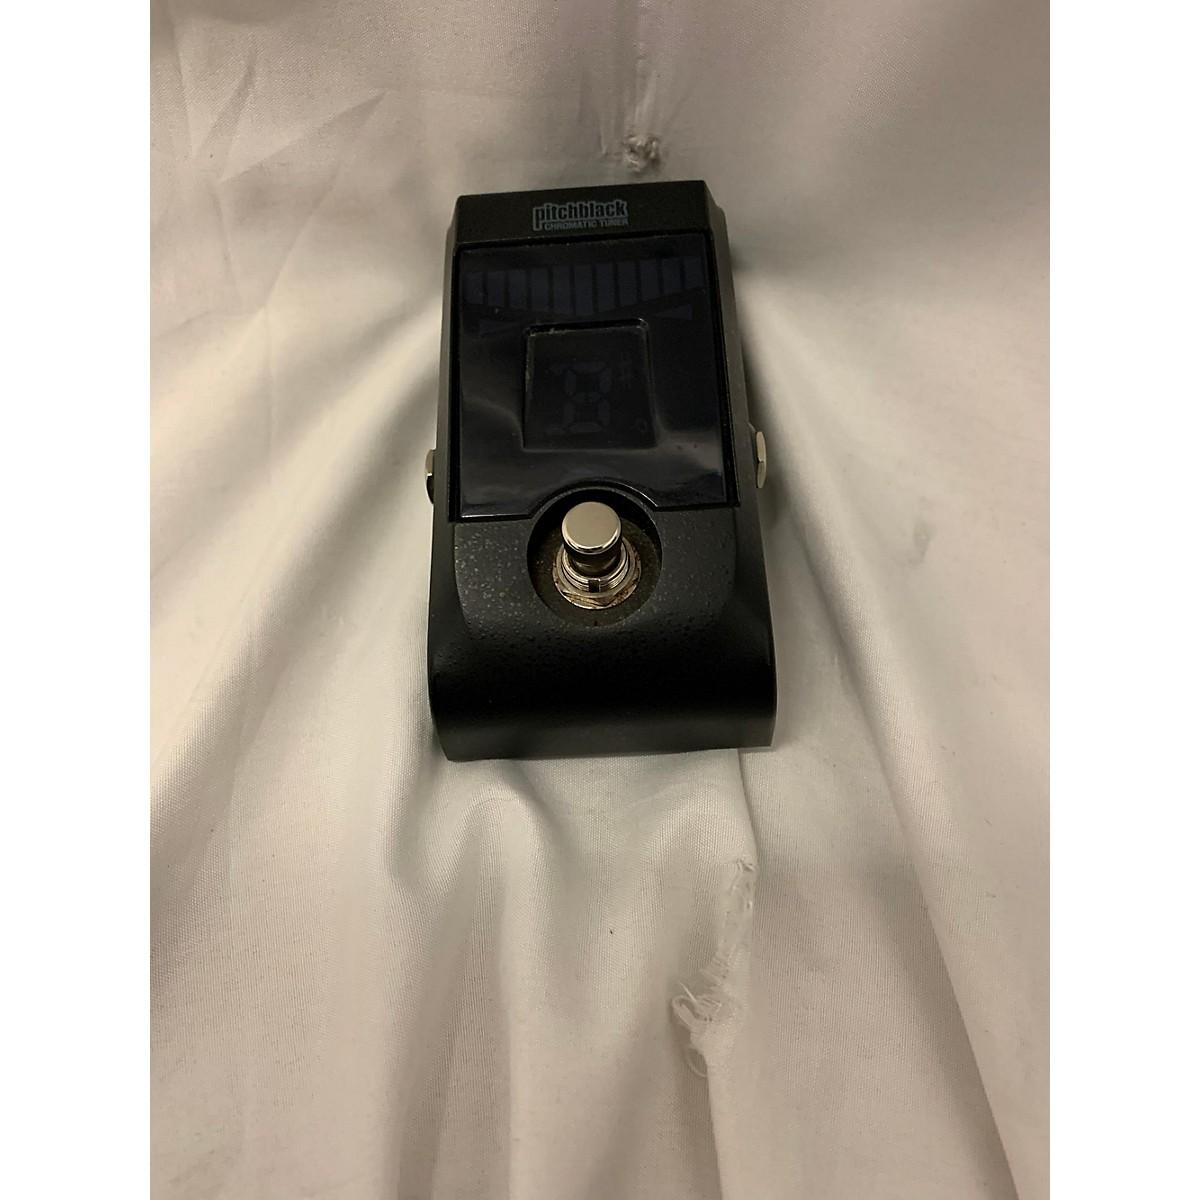 Korg 2010s PB01 Pitchblack Chromatic Tuner Pedal